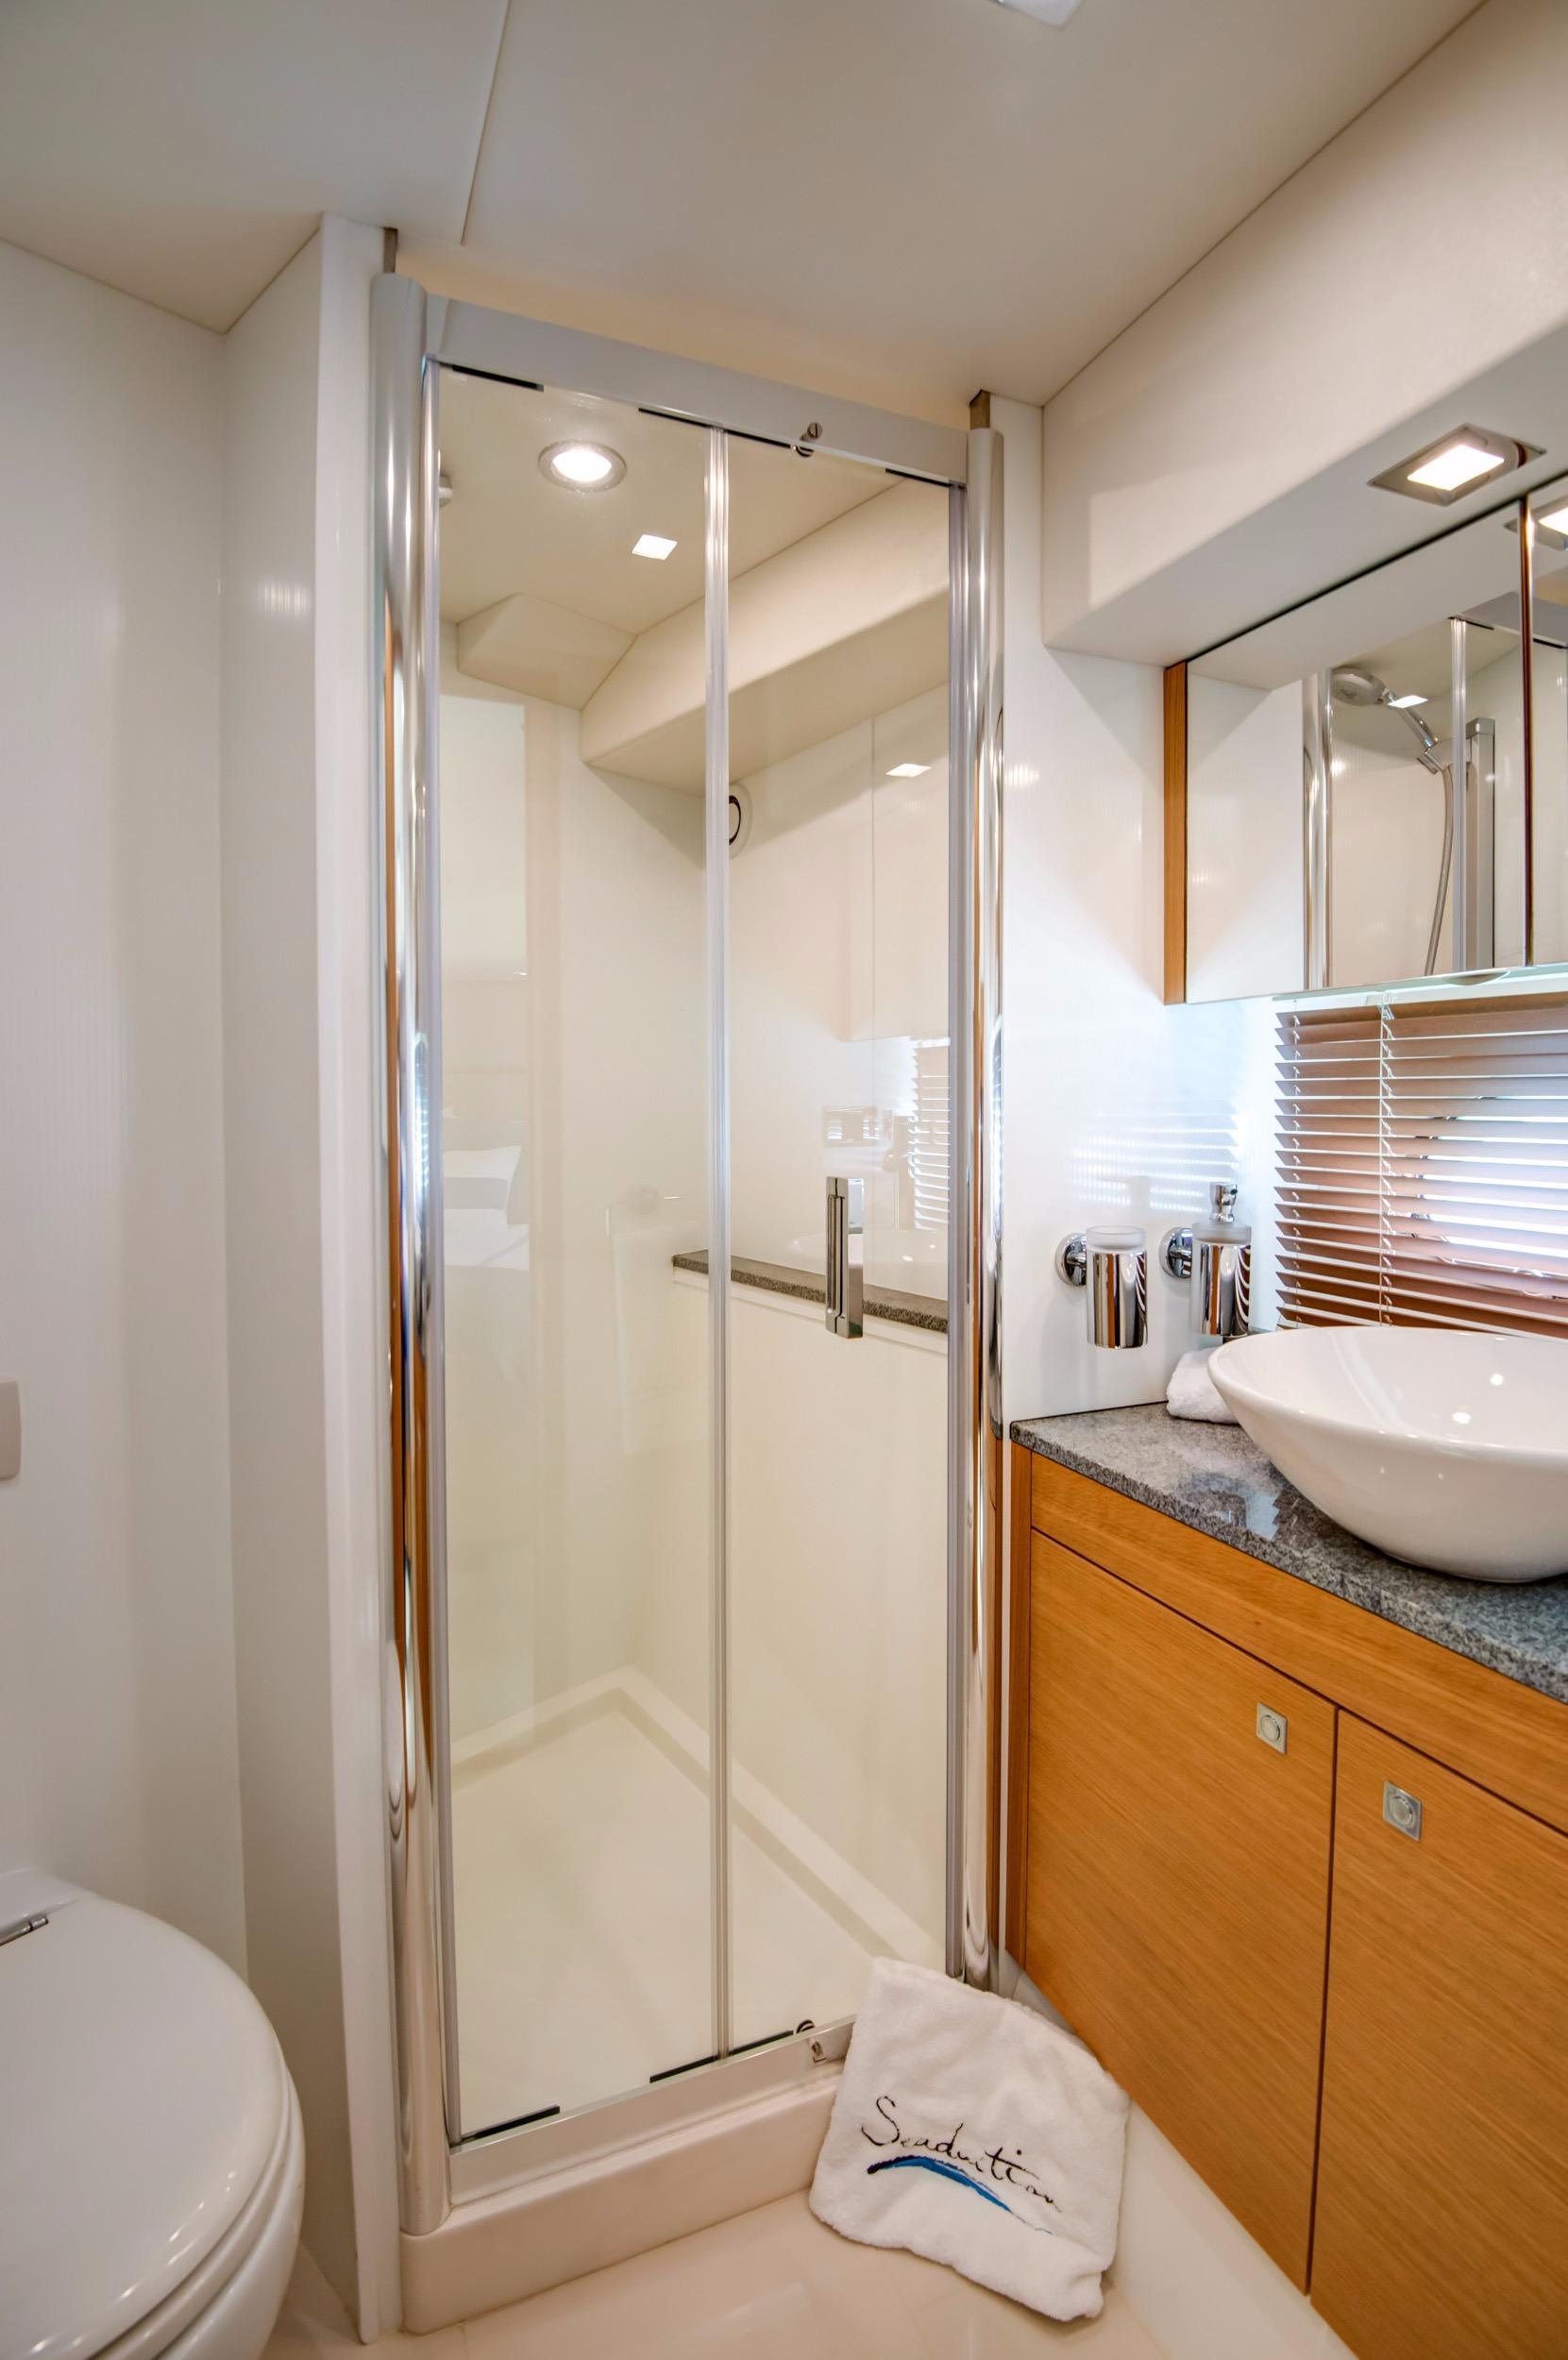 pinterest splendor shower pin frameless molding doors door sourceabl com